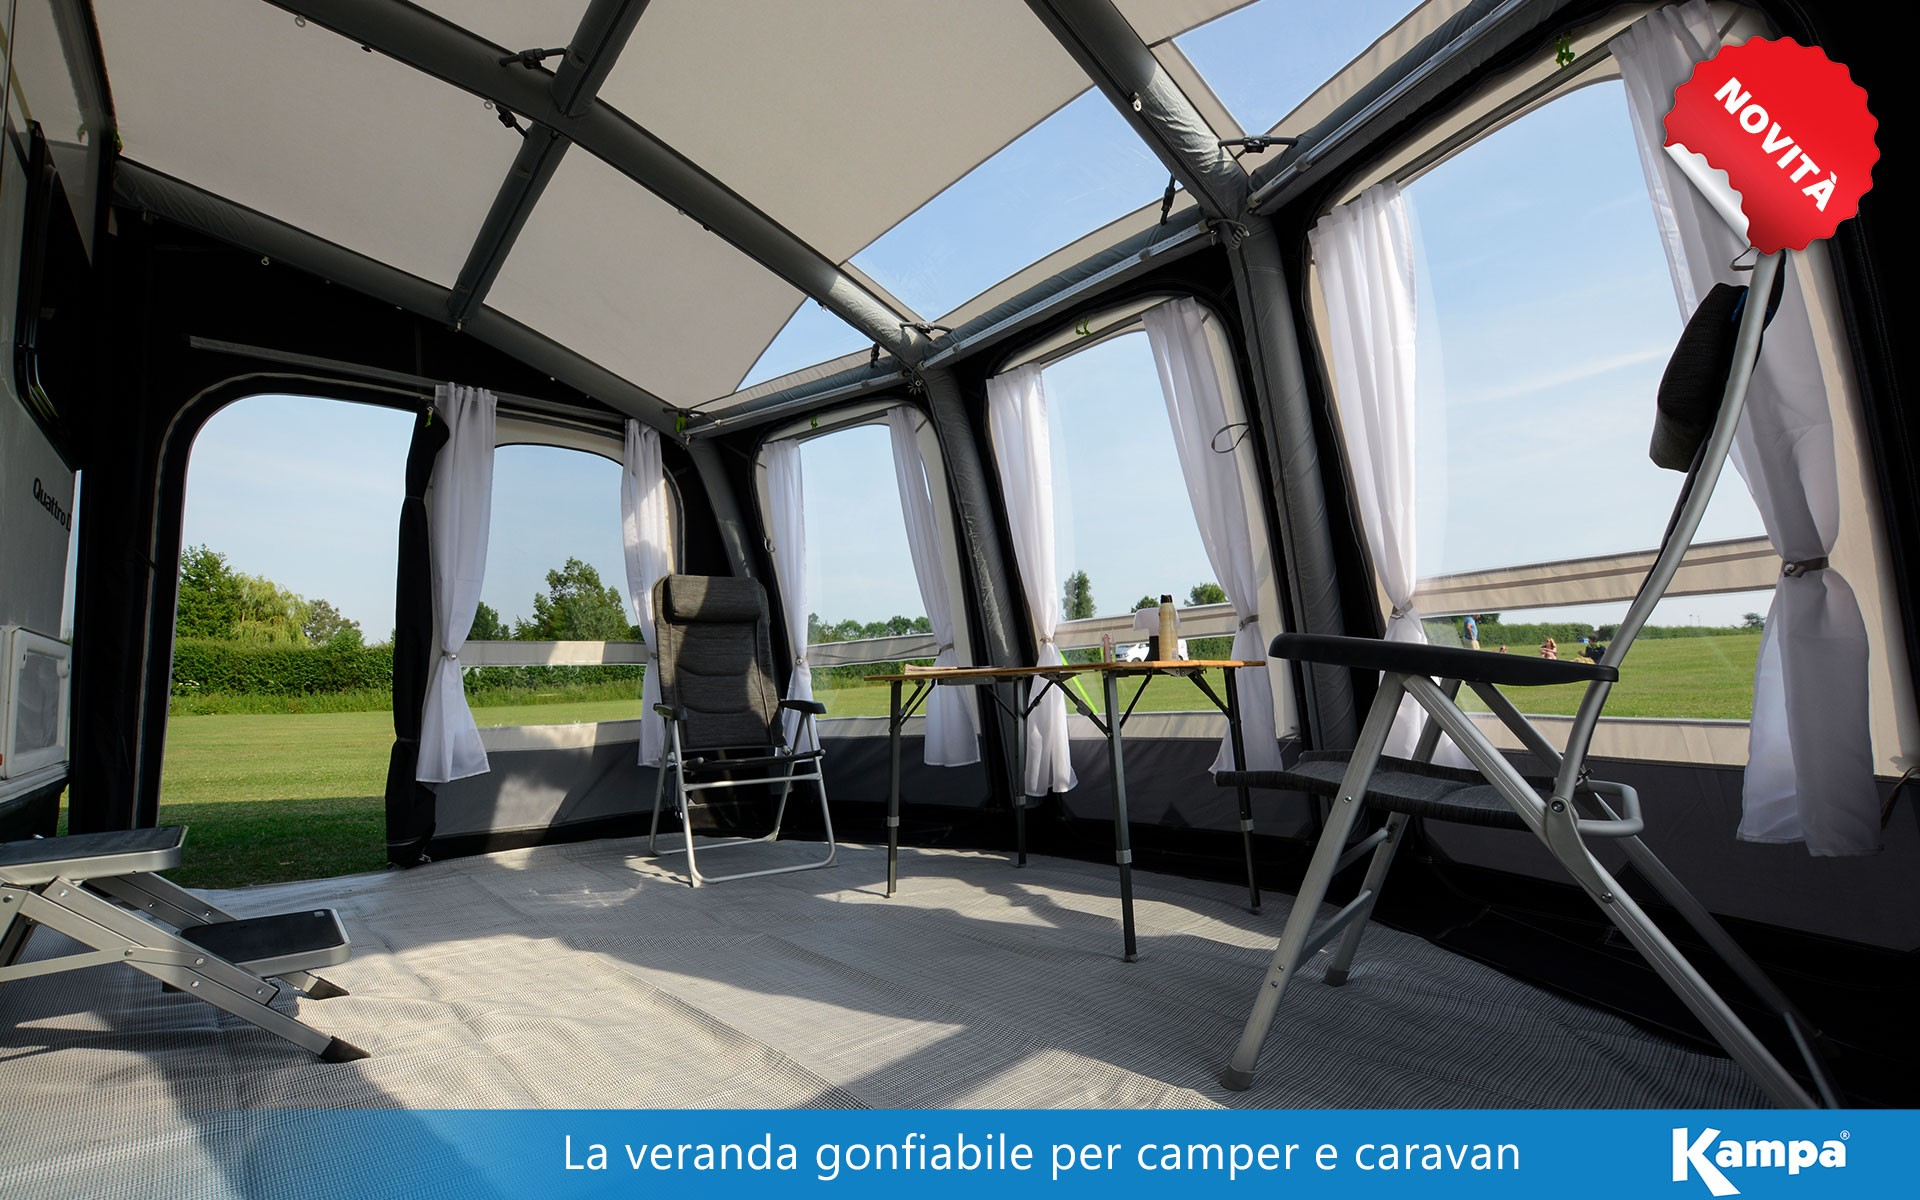 Veranda gonfiabile per caravan e camper